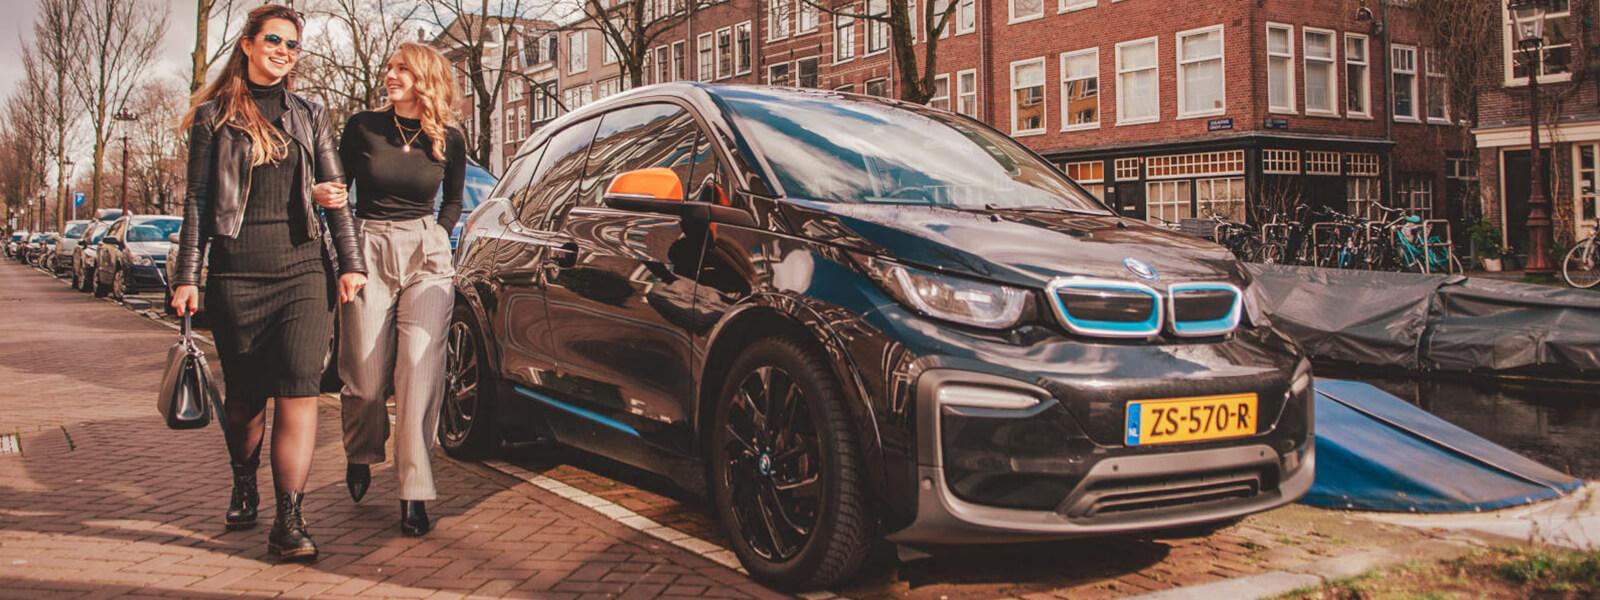 sixt share carsharing nl